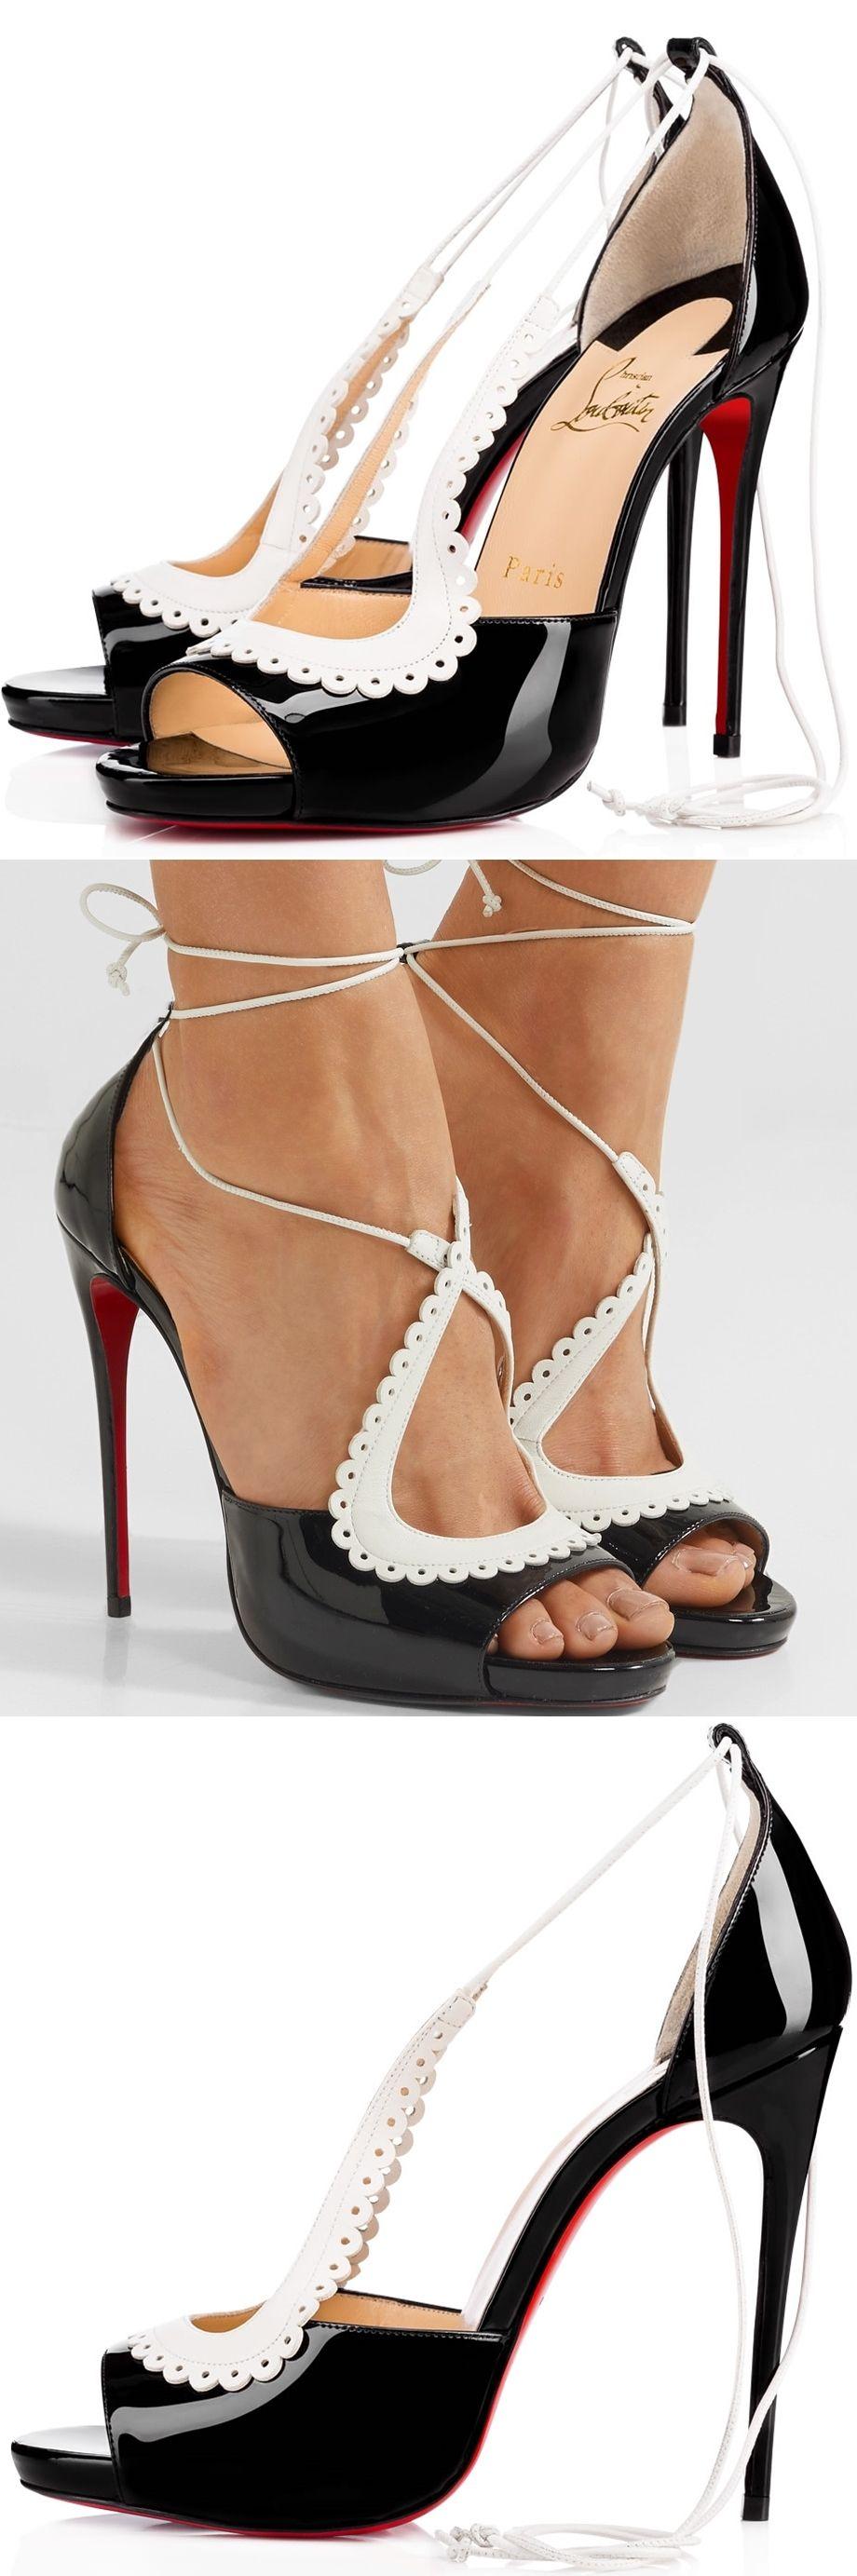 Christian Louboutin\u0027s \u0027Operissima\u0027 sandals are modeled on the brand\u0027s  classic silhouette but \